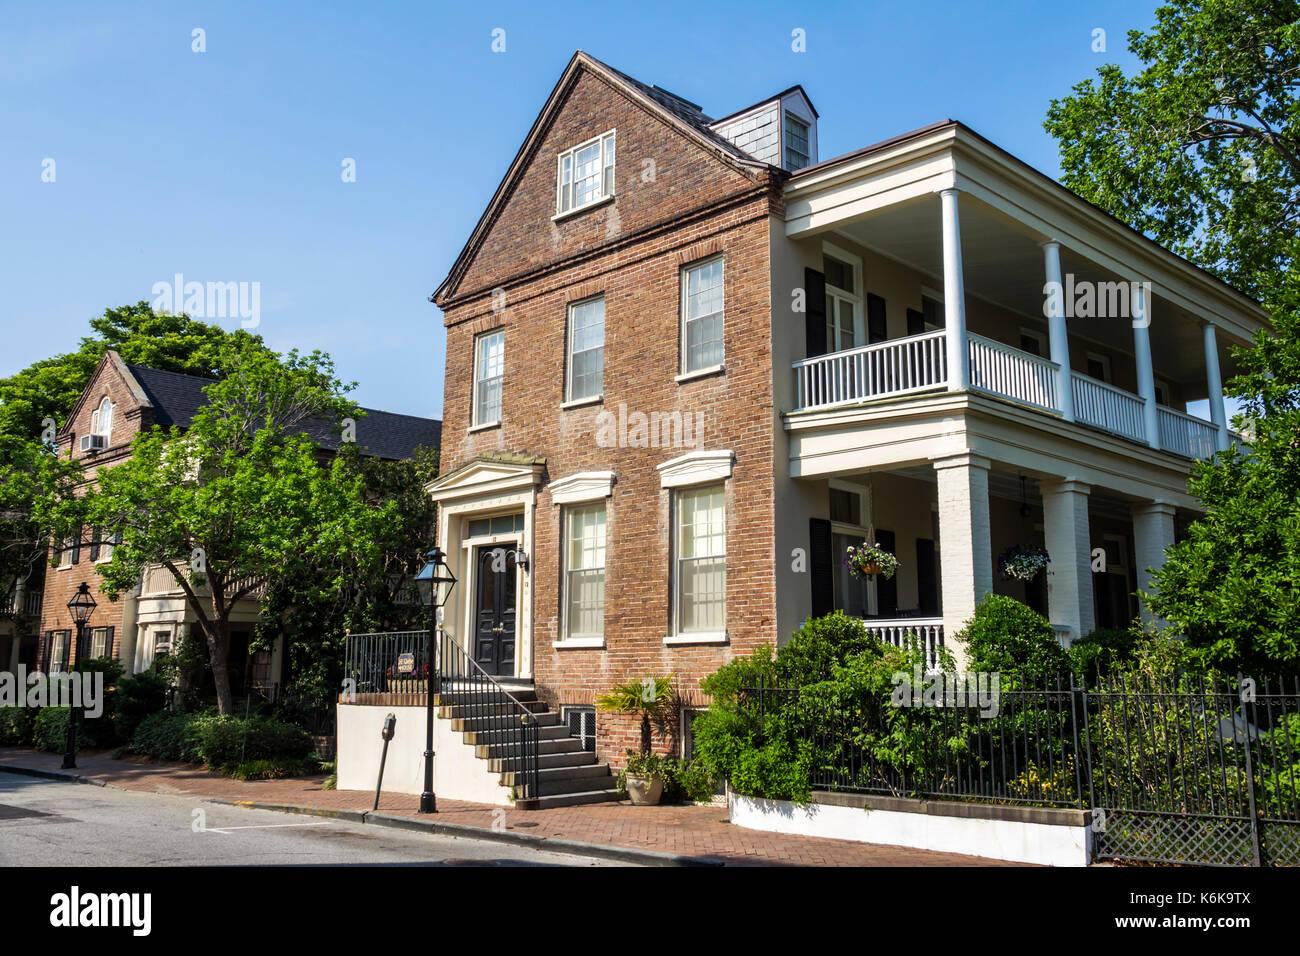 Charleston South Carolina SC College of Charleston university Glebe House haunted mansion antebellum - Stock Image